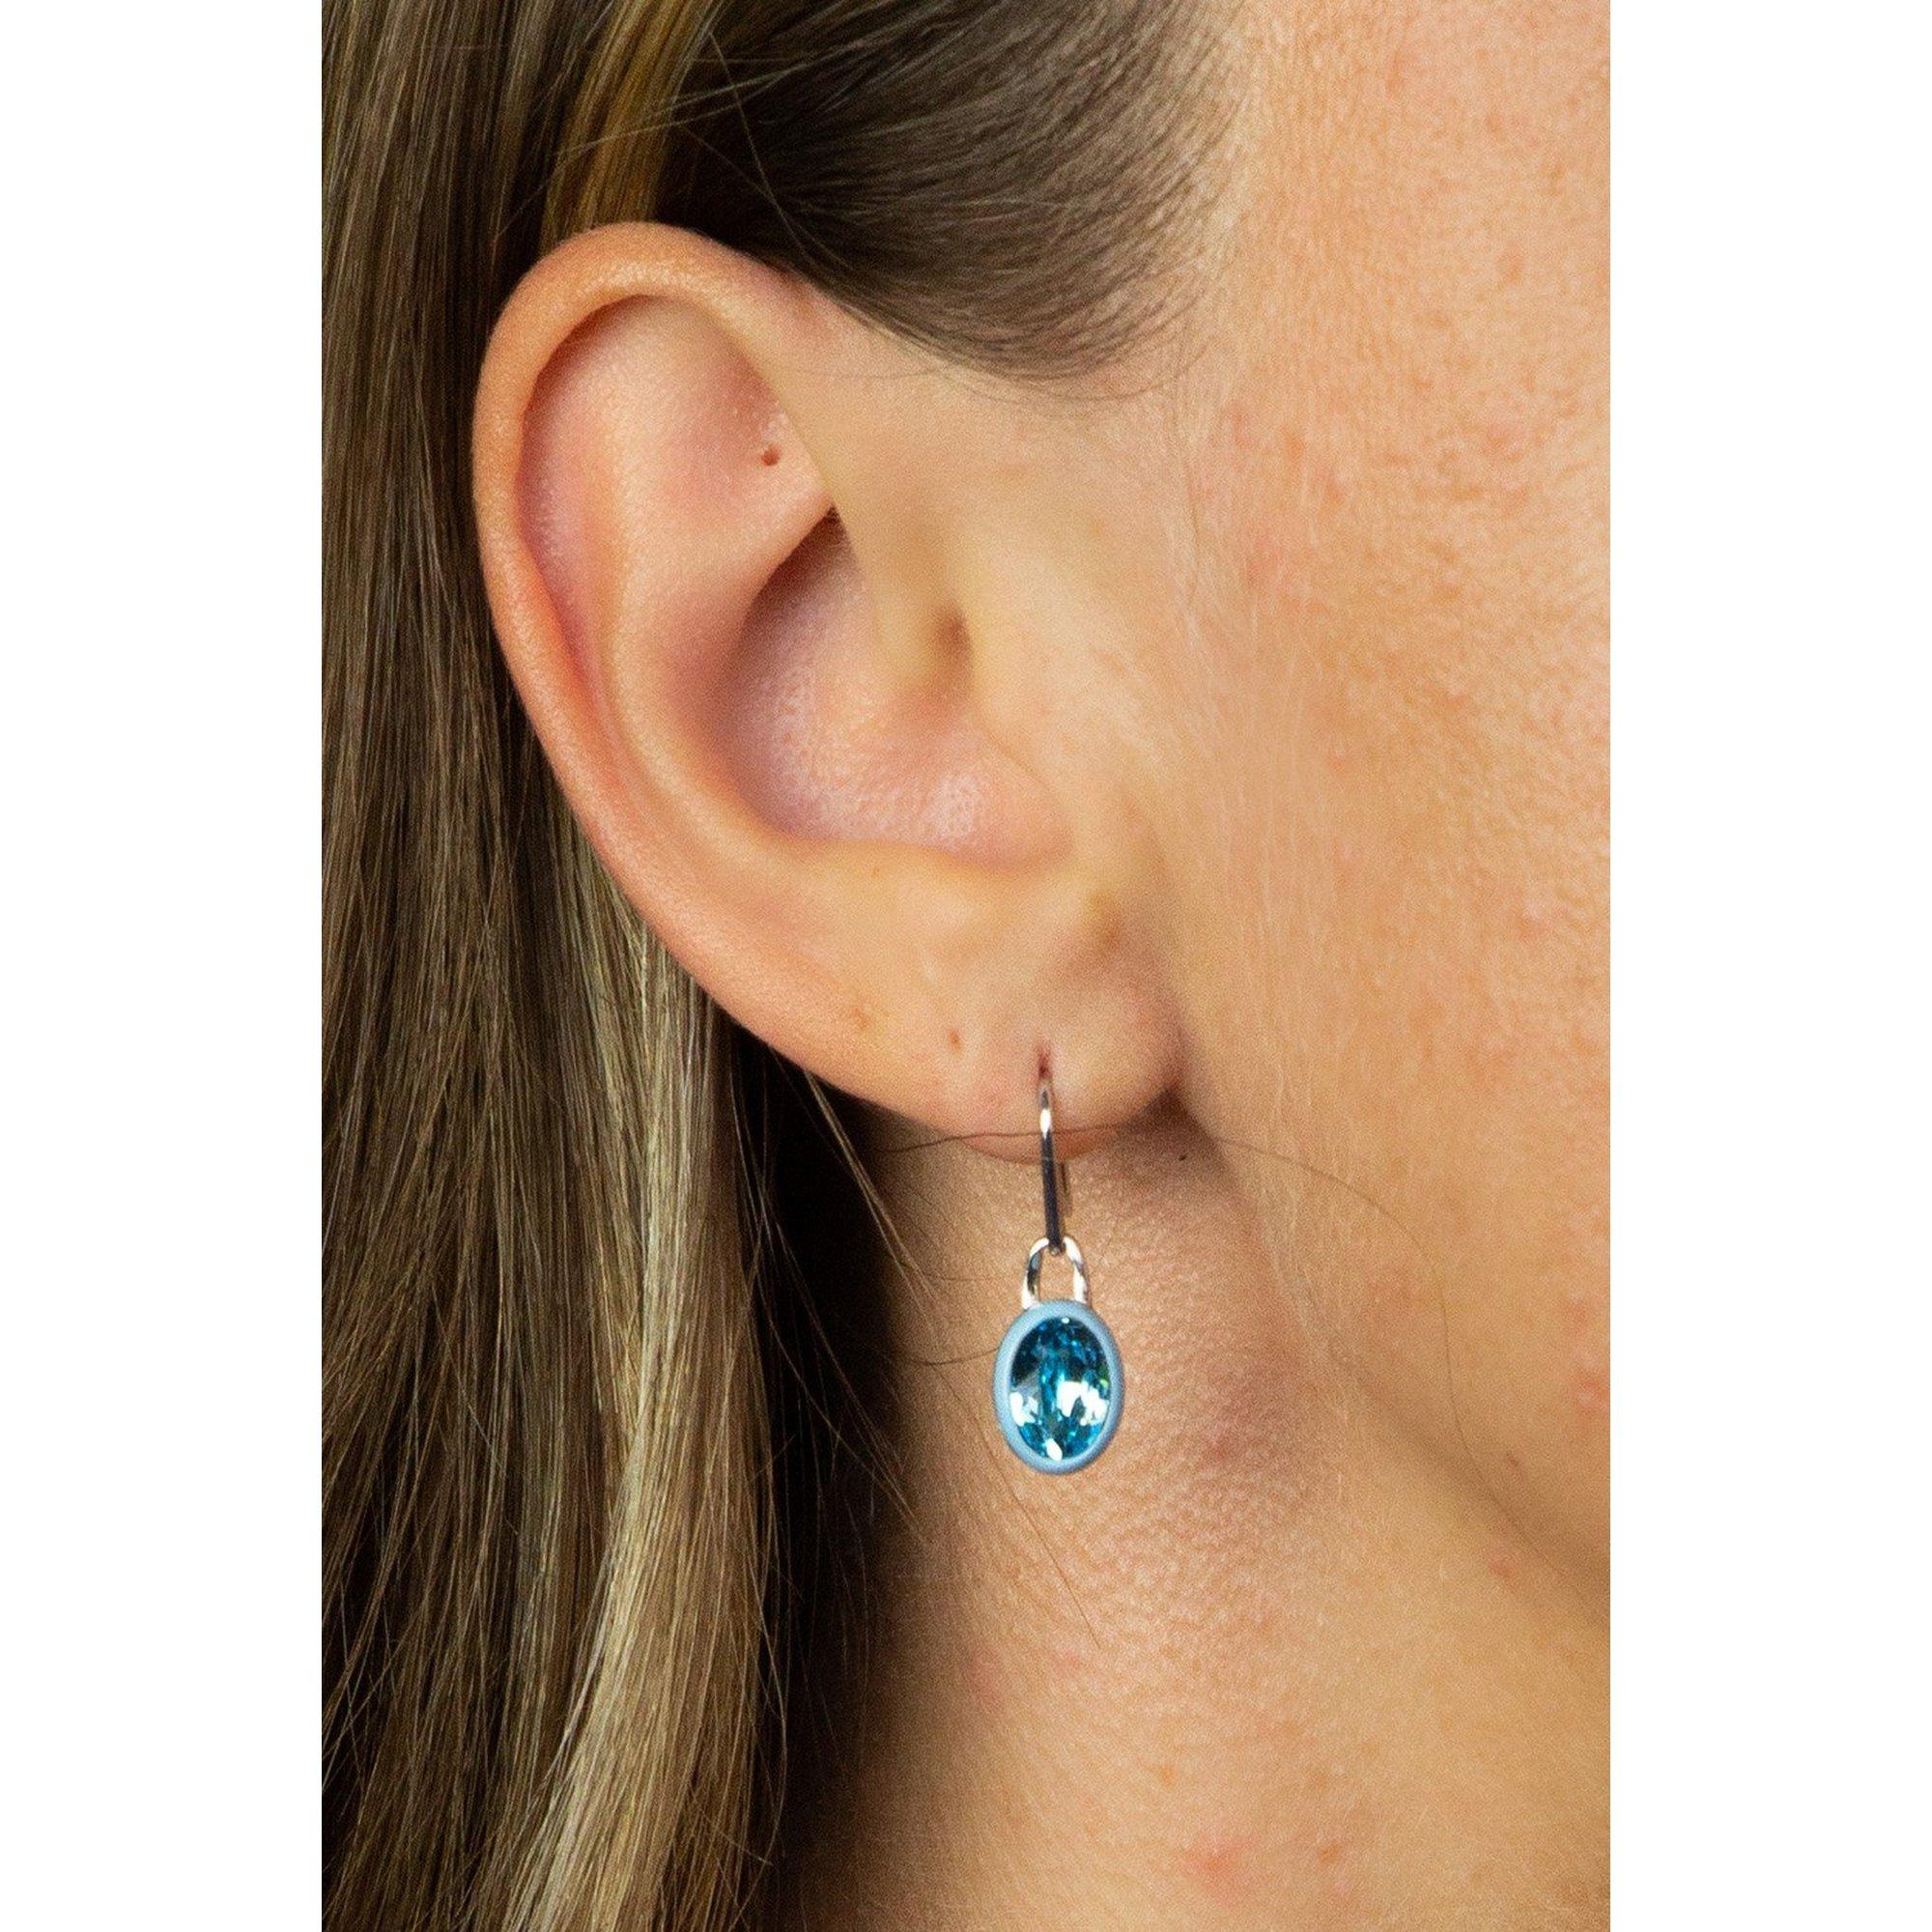 Image of Fiorelli Aqua Crystal Earrings with Blue Enamel Border